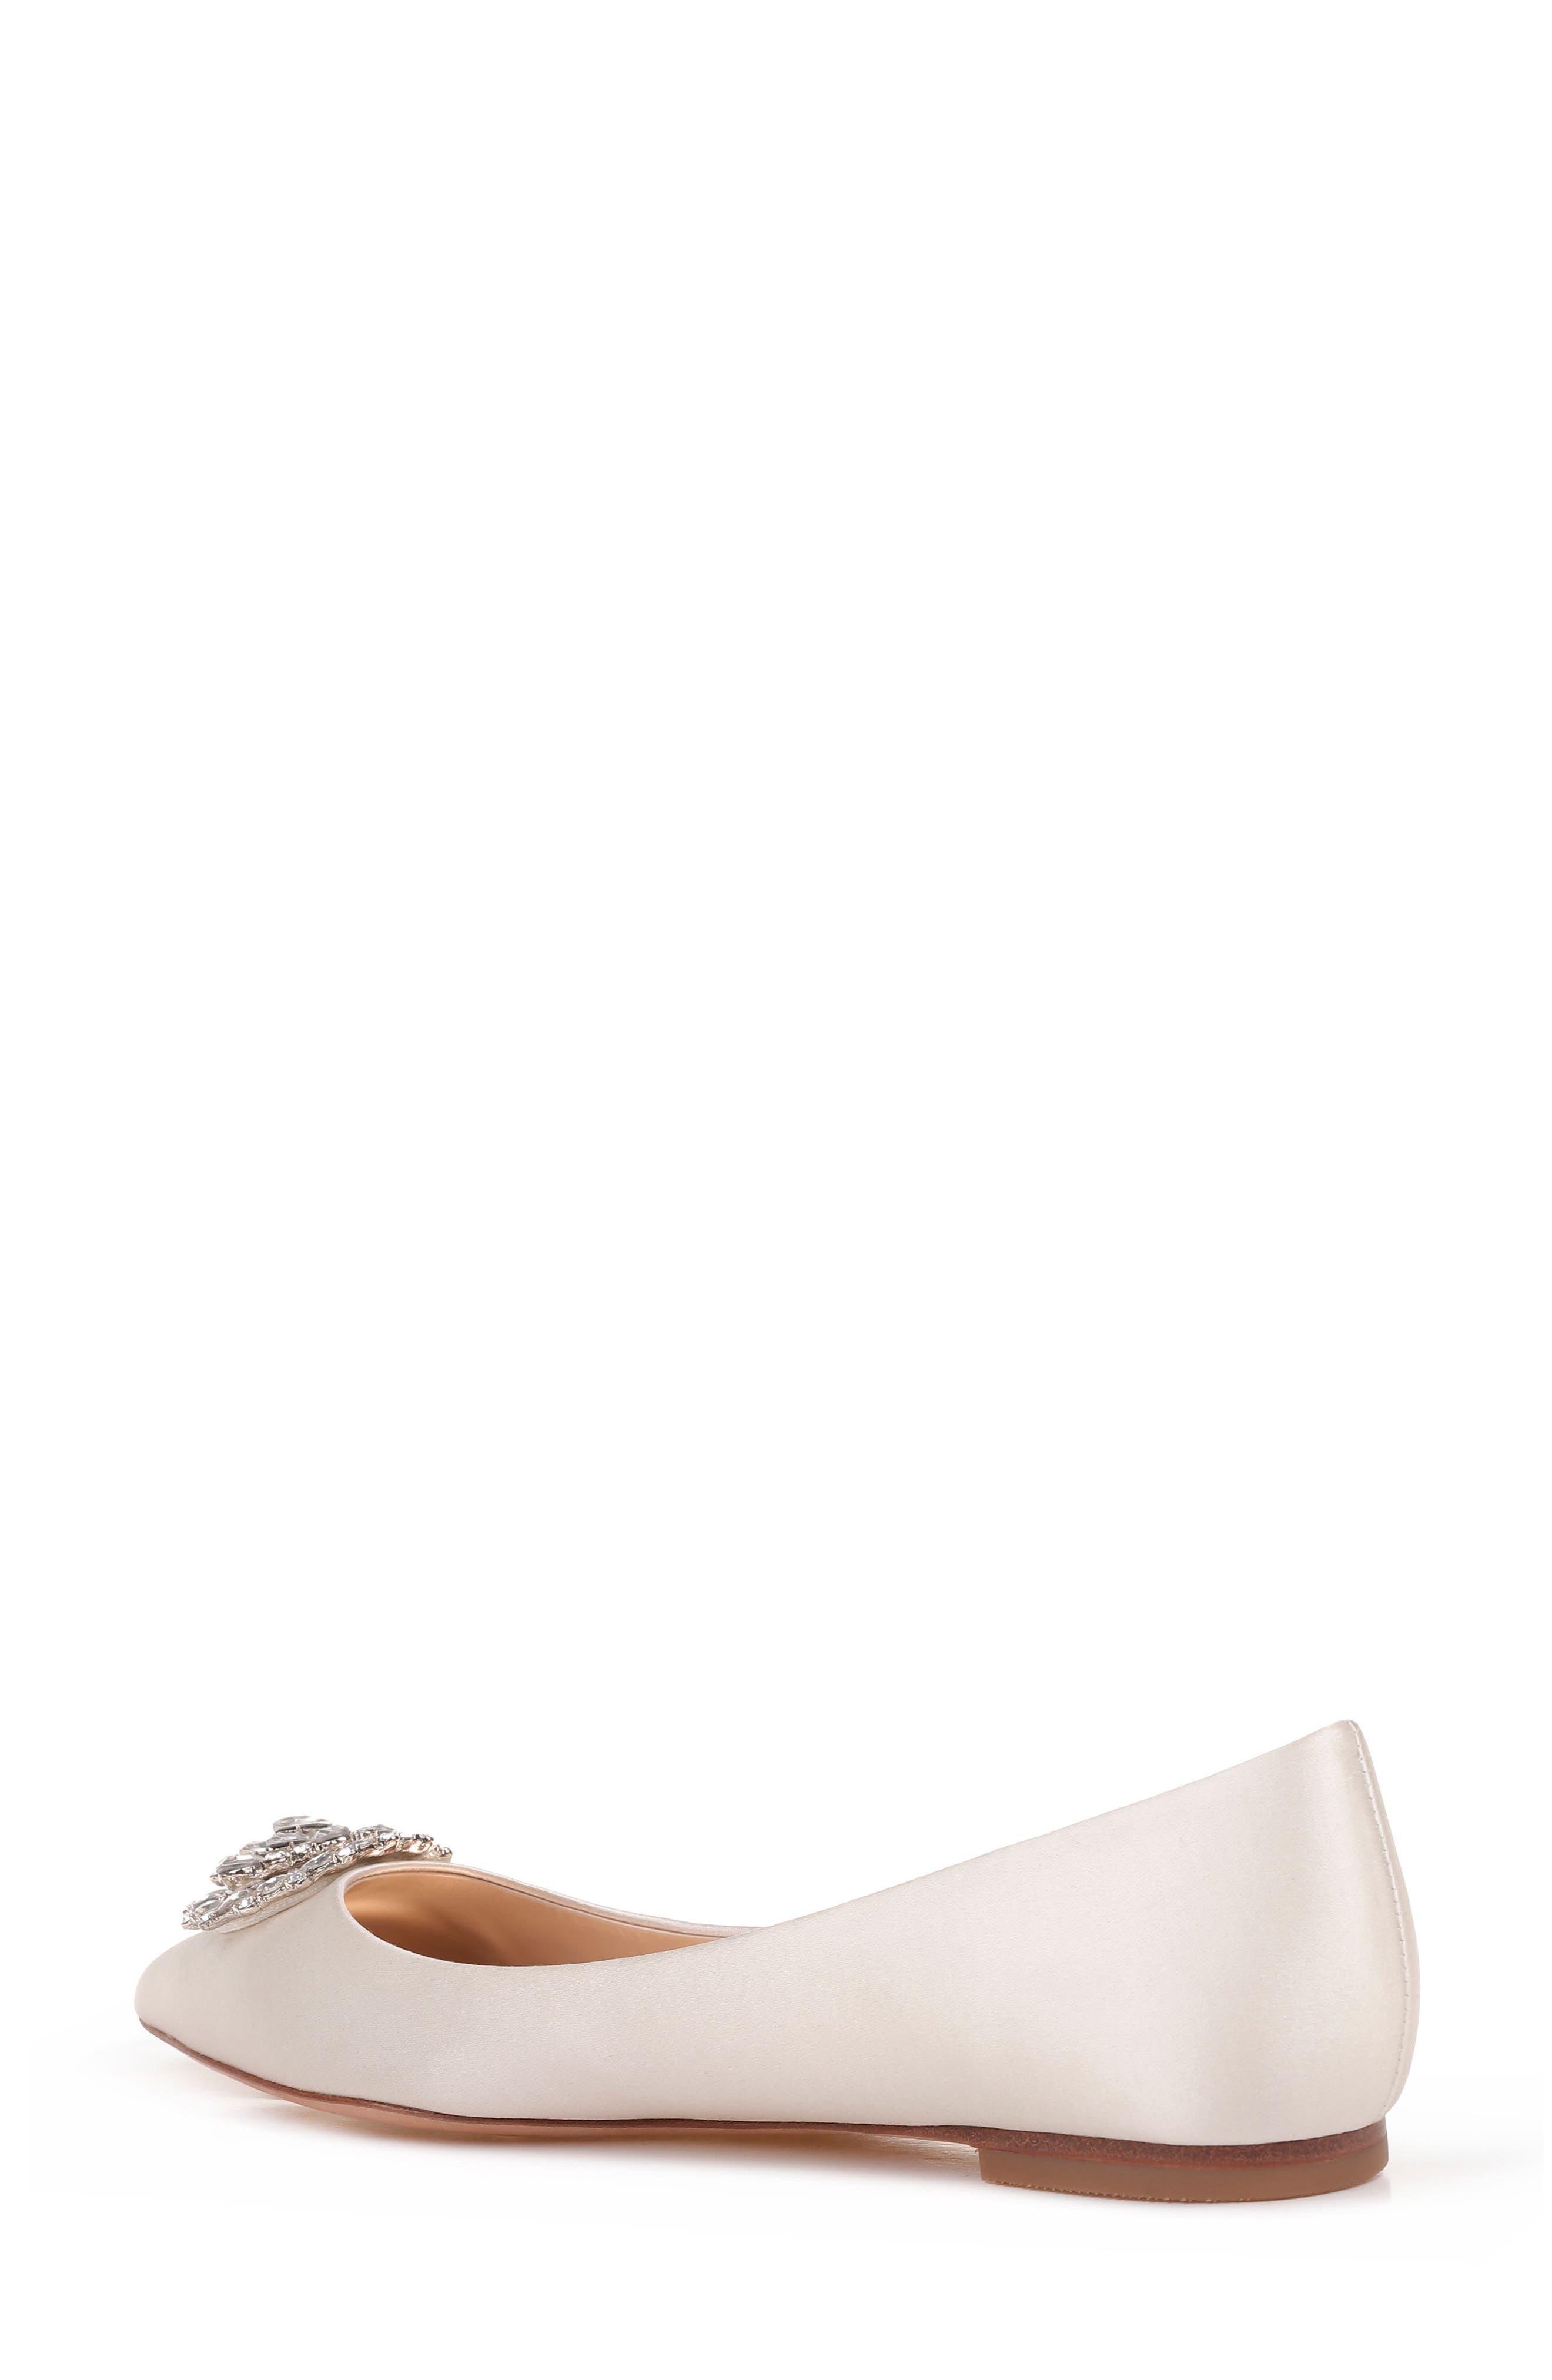 'Davis' Crystal Embellished Pointy Toe Flat,                             Alternate thumbnail 2, color,                             Ivory Satin